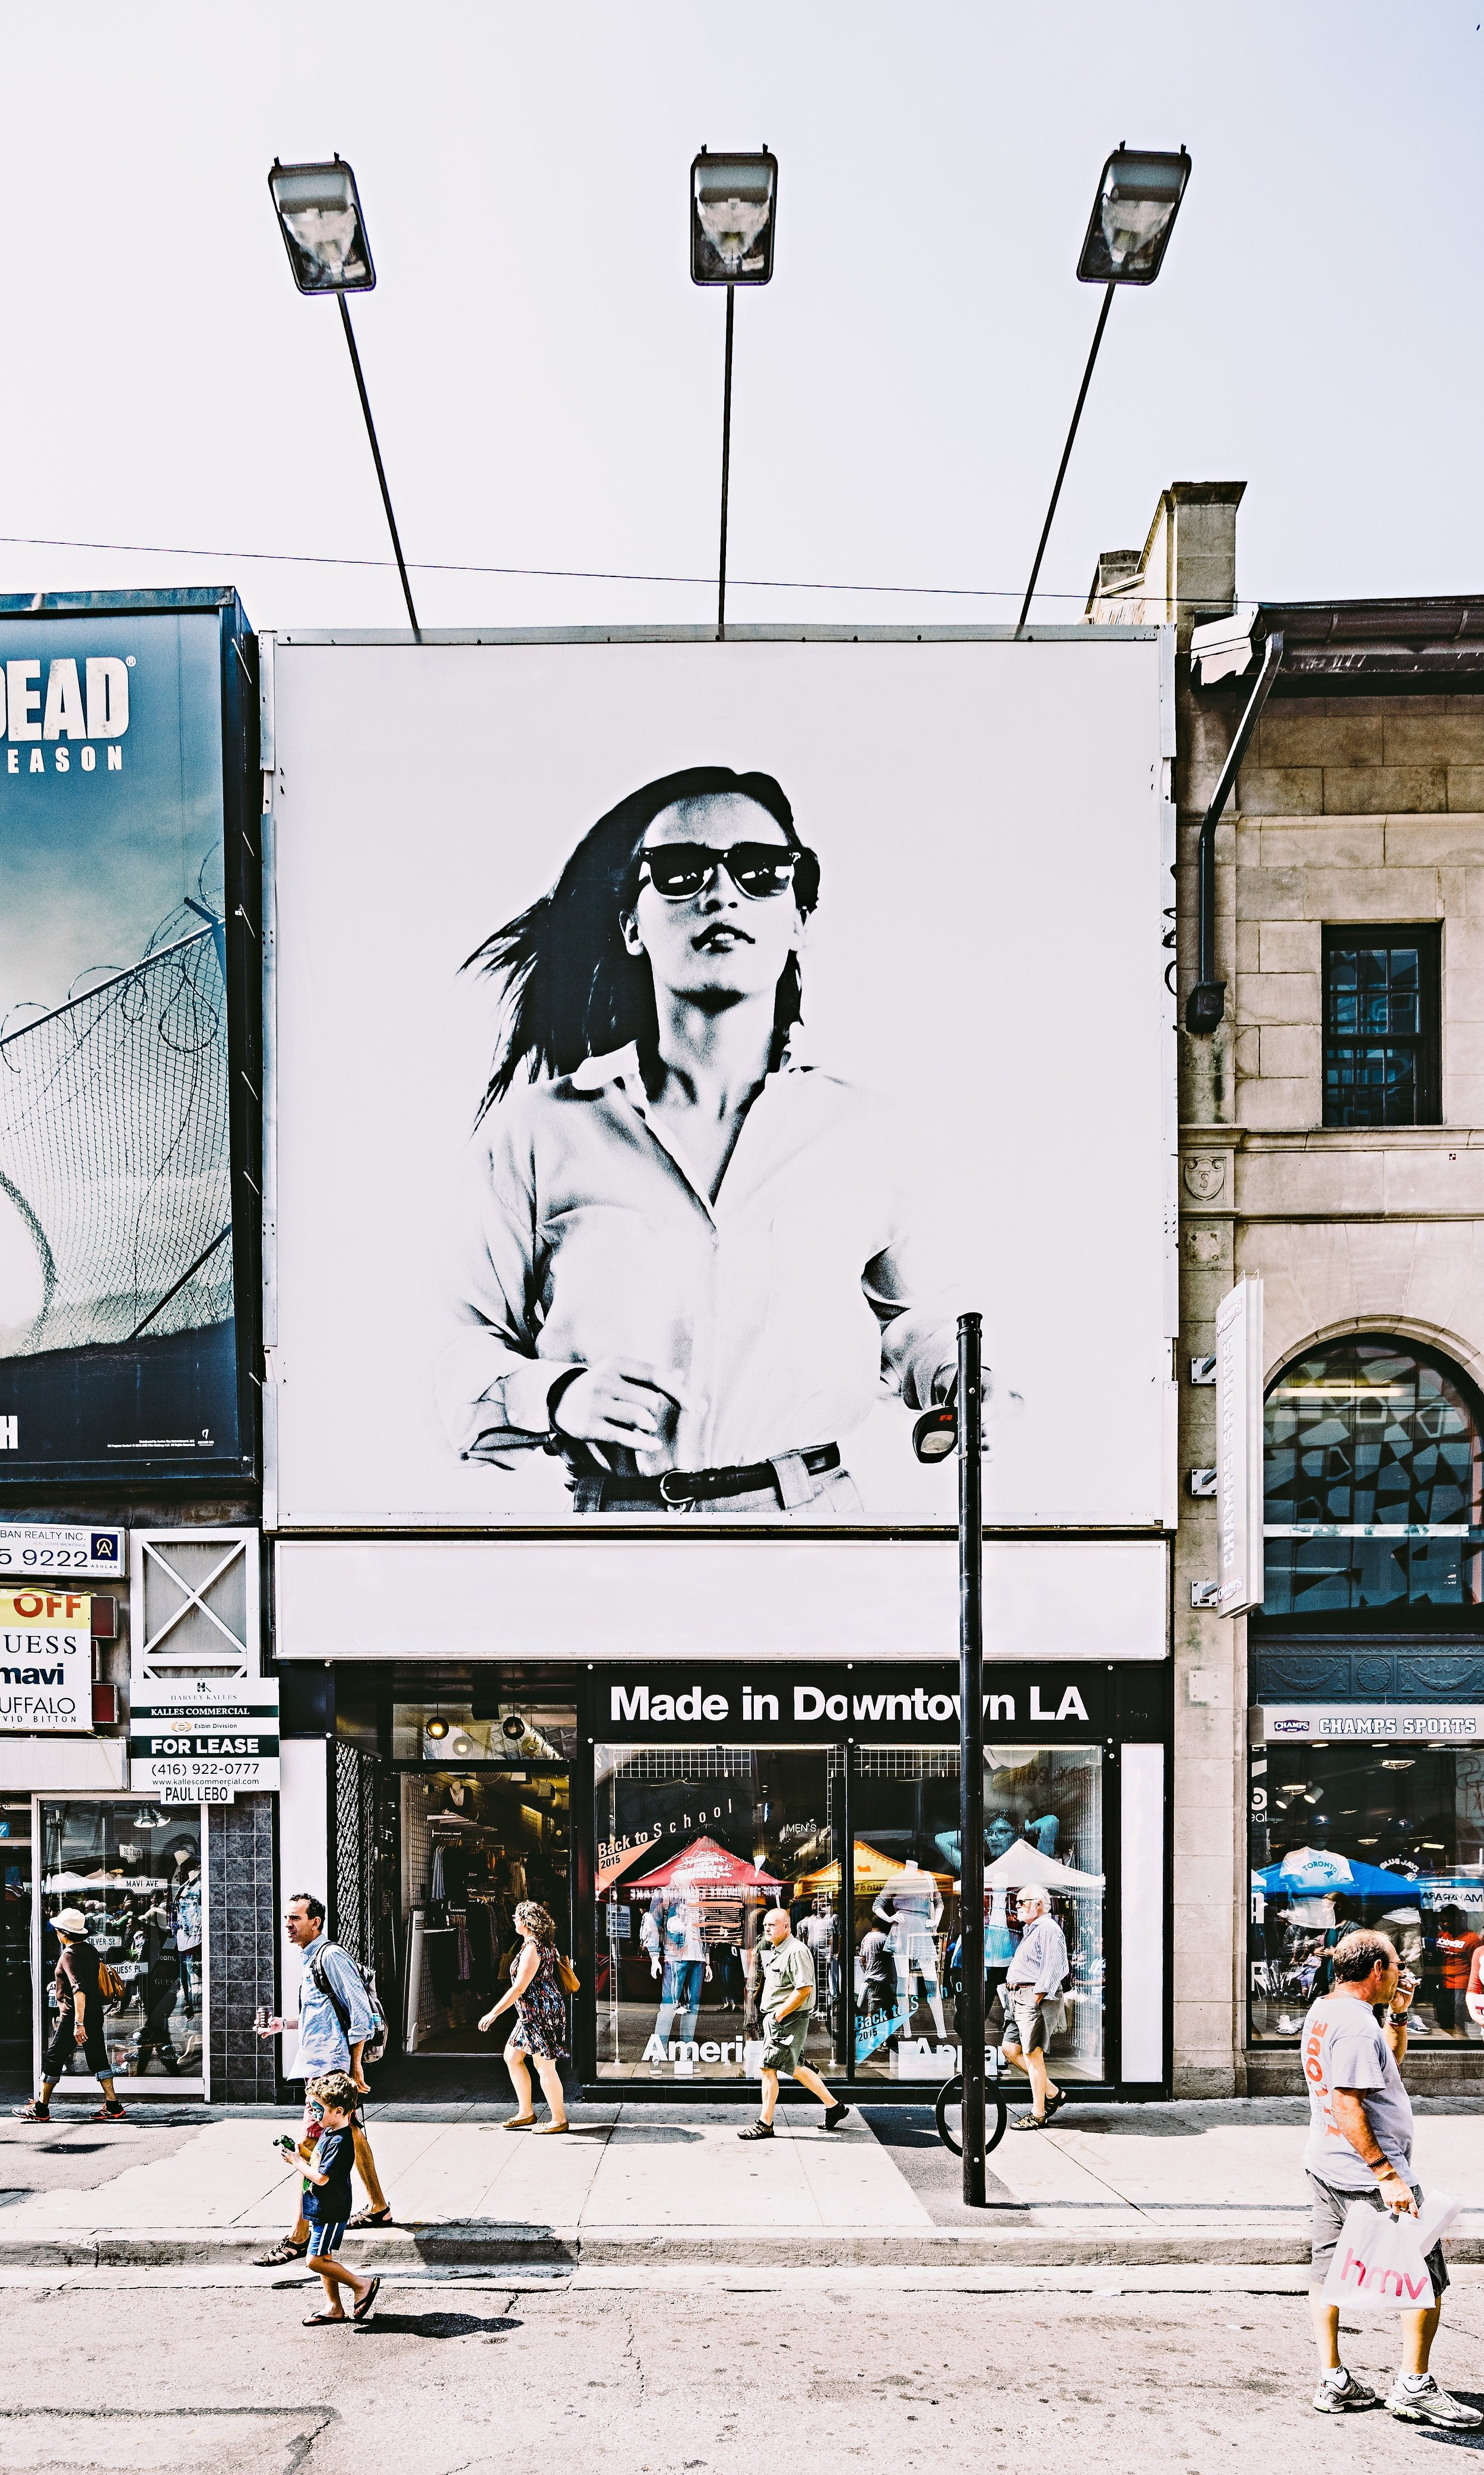 adult-architecture-billboard-1029597.jpg